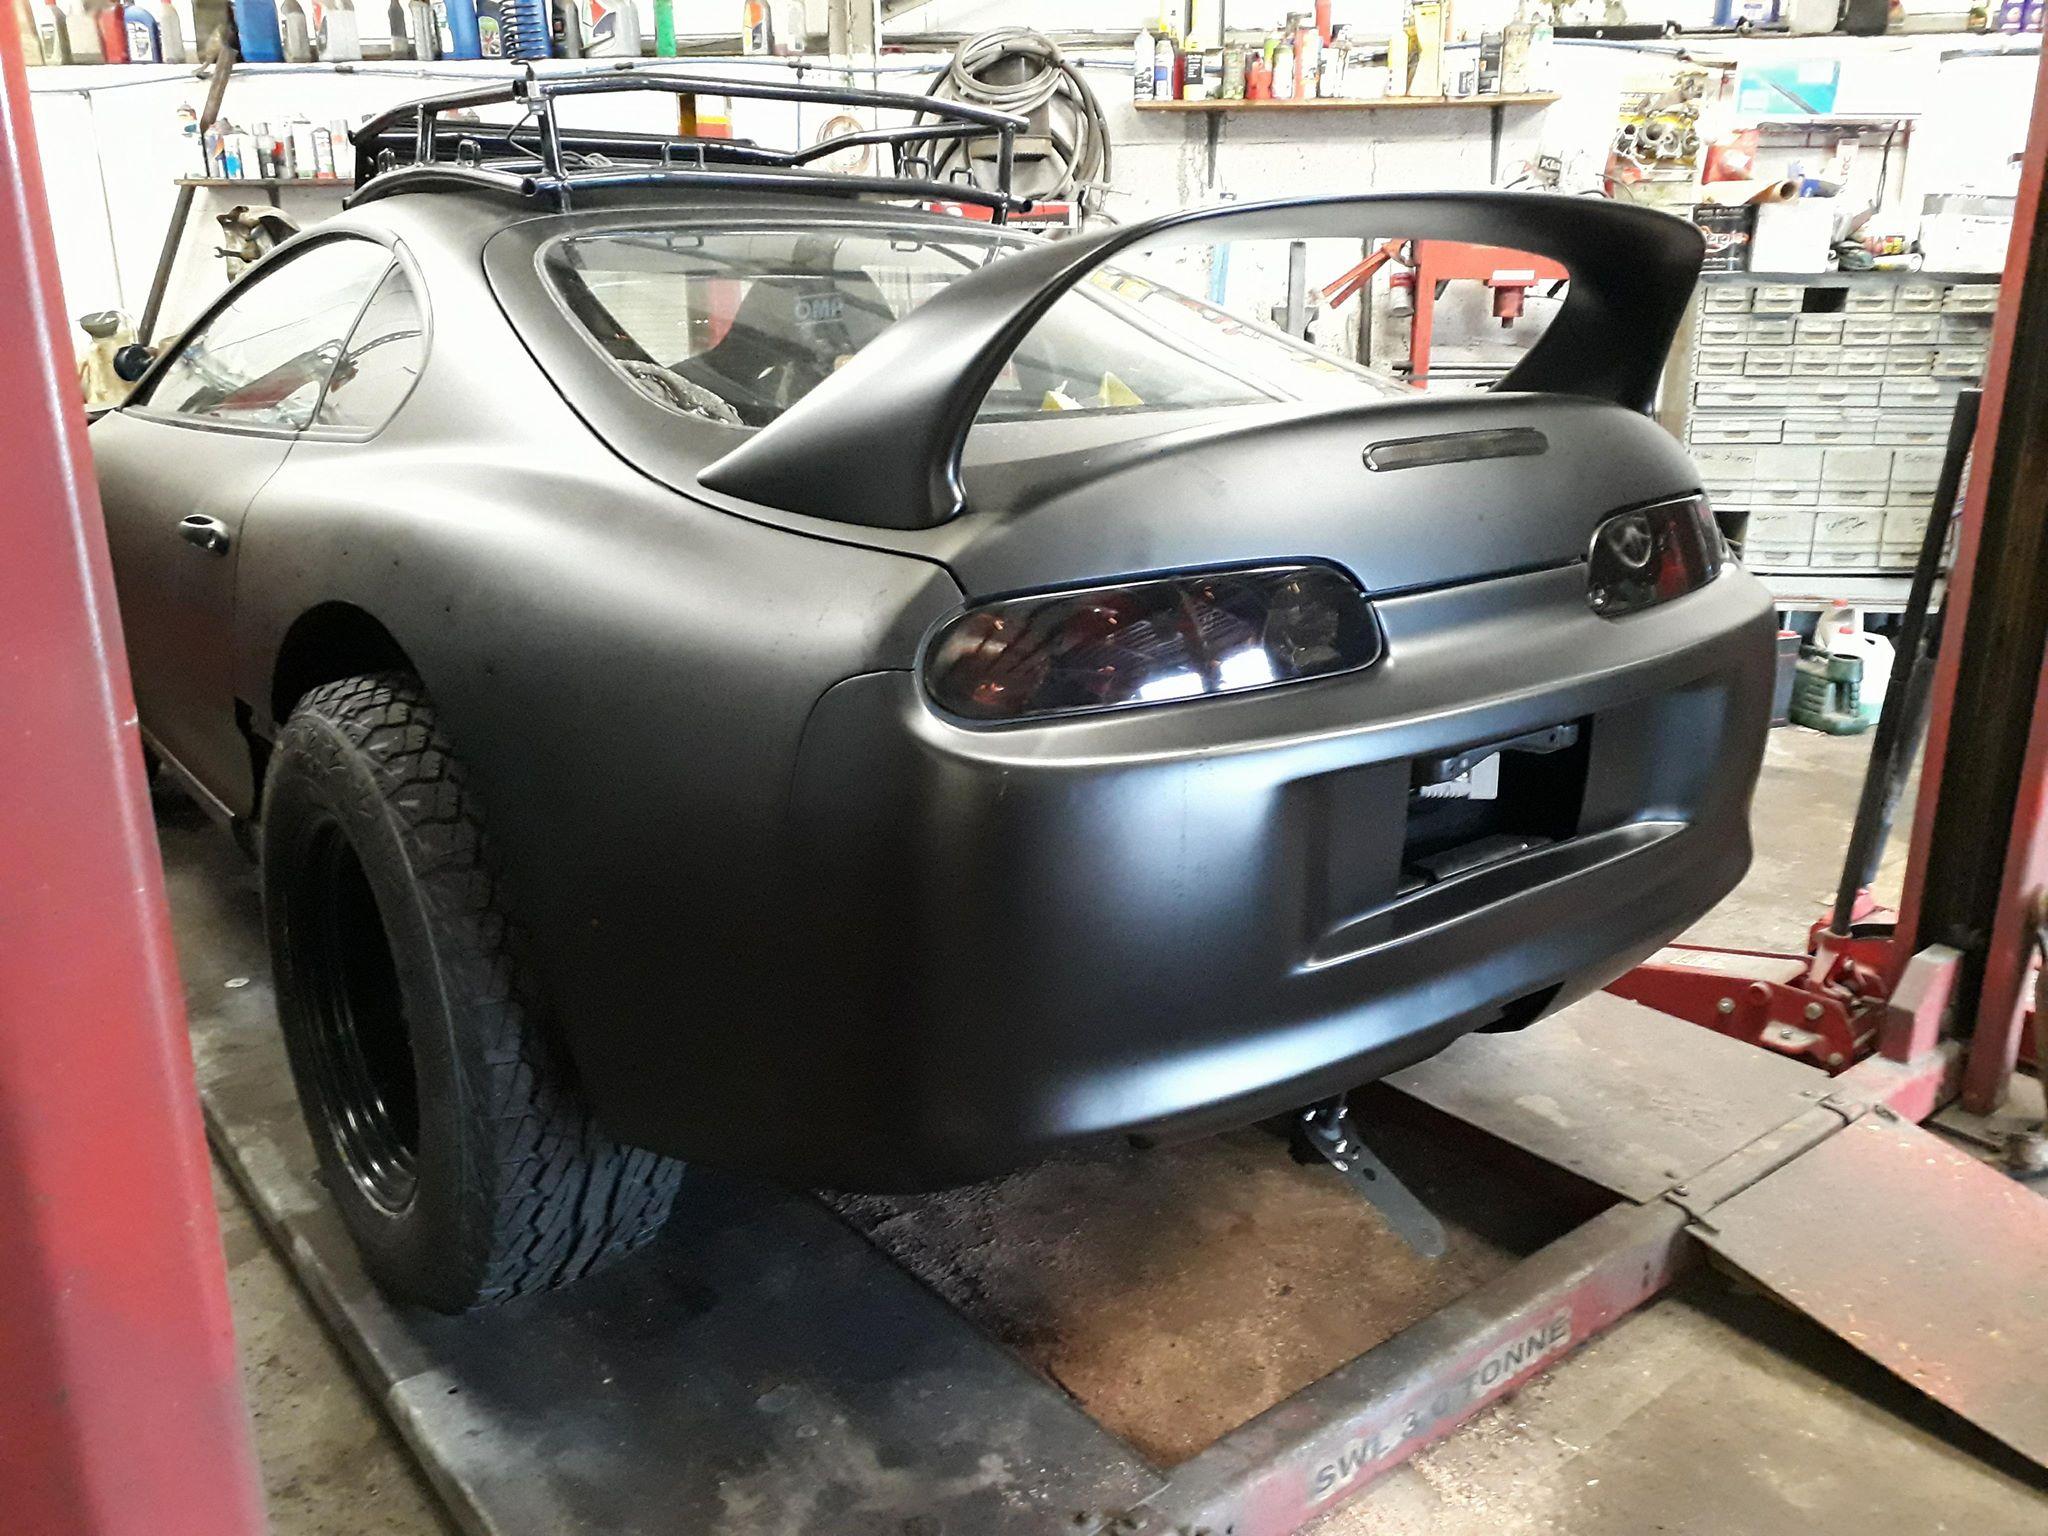 Toyota-Supra-Cummins-engine-swap-10